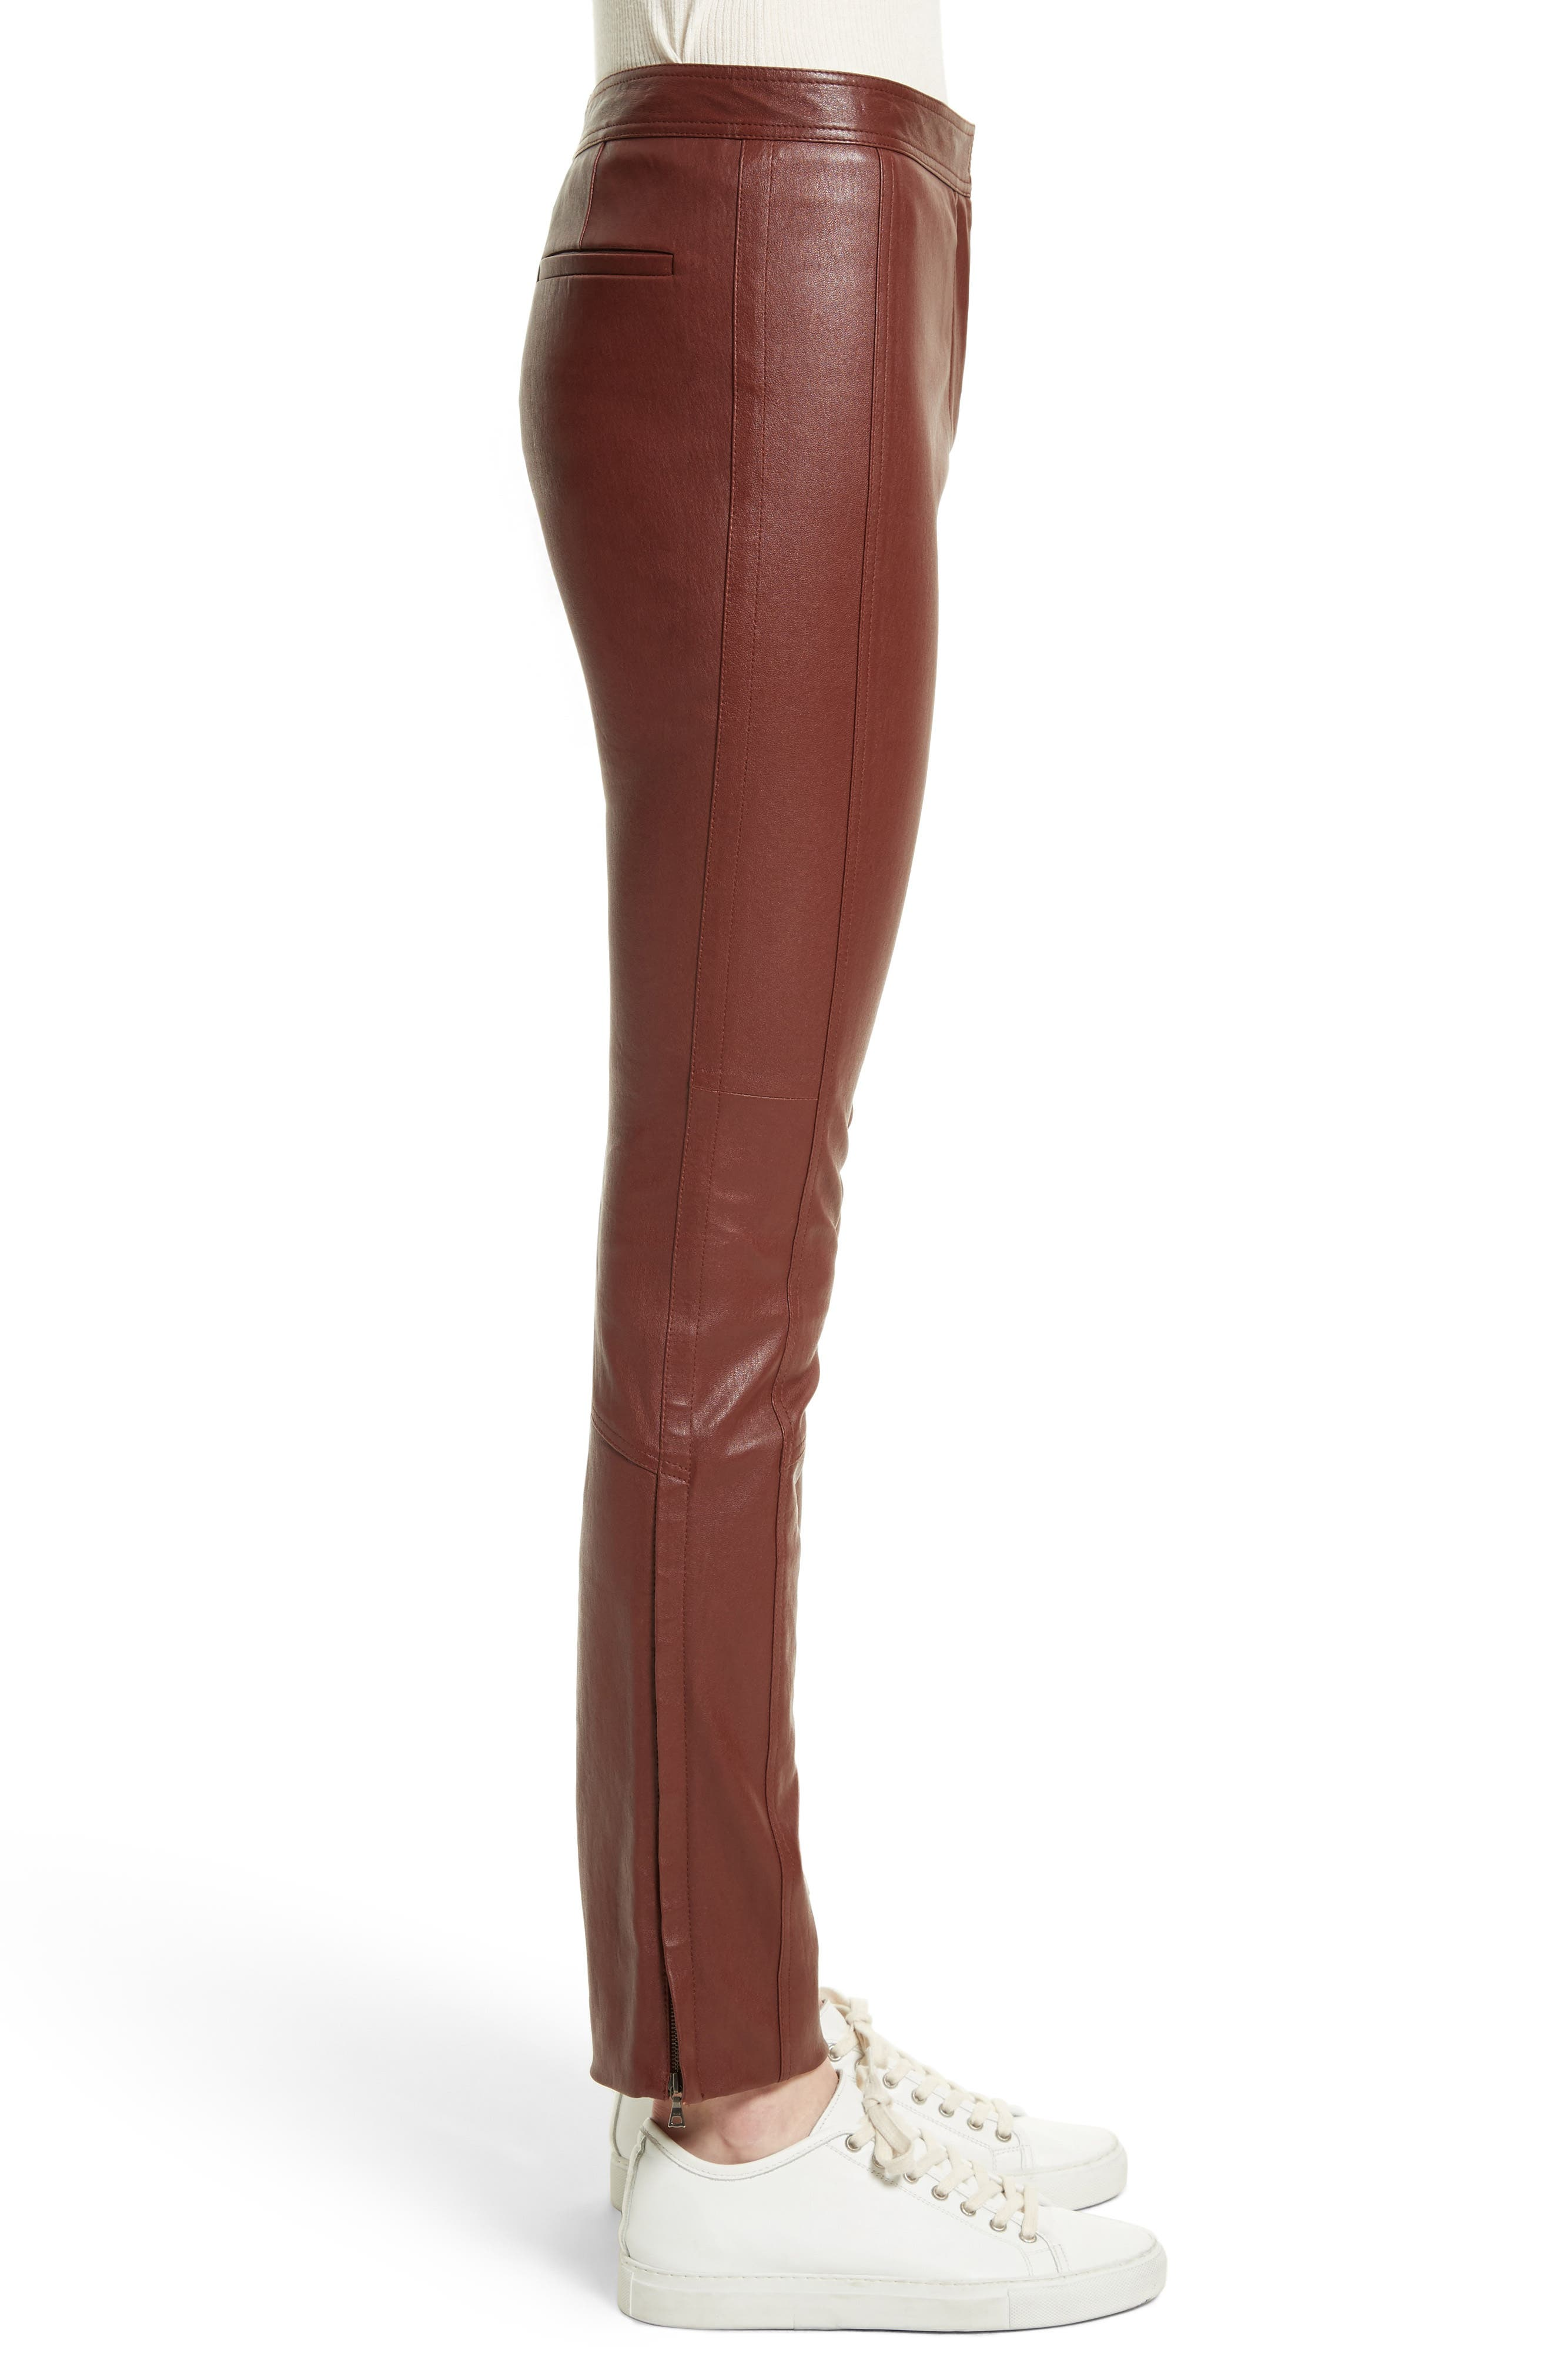 Bristol Leather Riding Pants,                             Alternate thumbnail 3, color,                             215